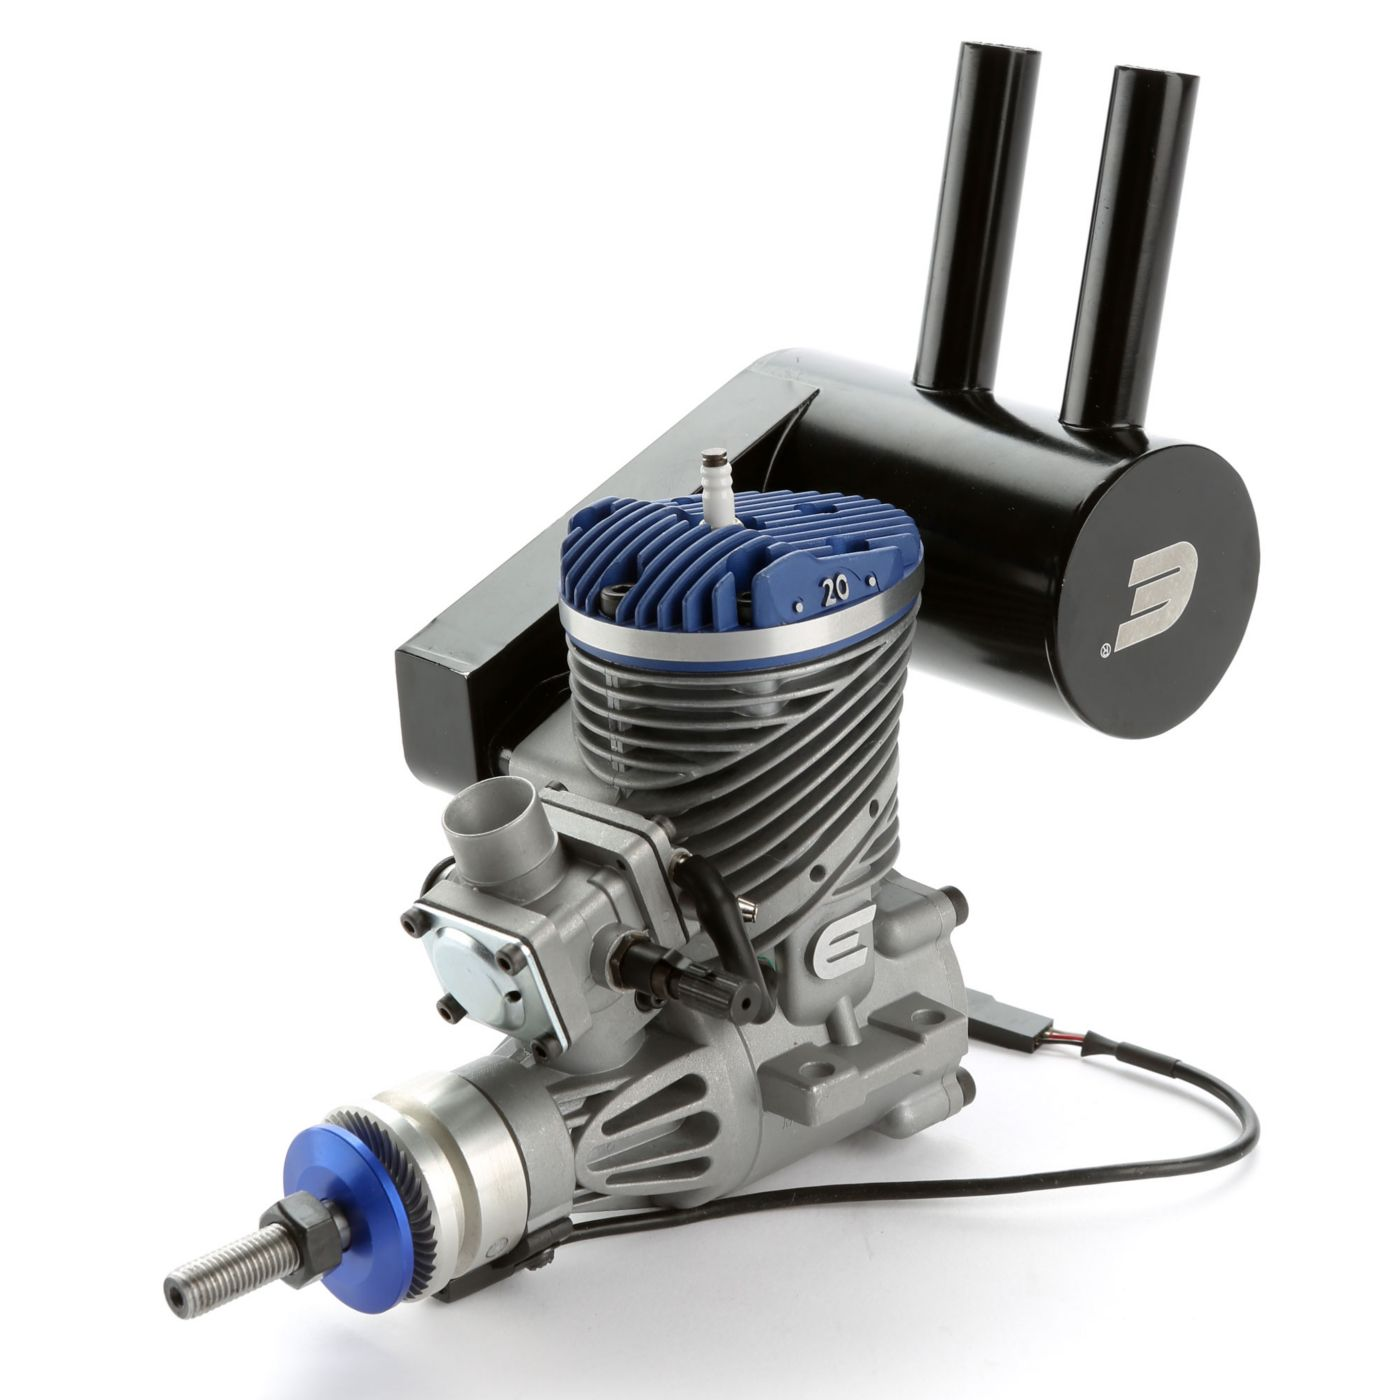 20GX 20cc Gas Engine with Pumped Carburettor